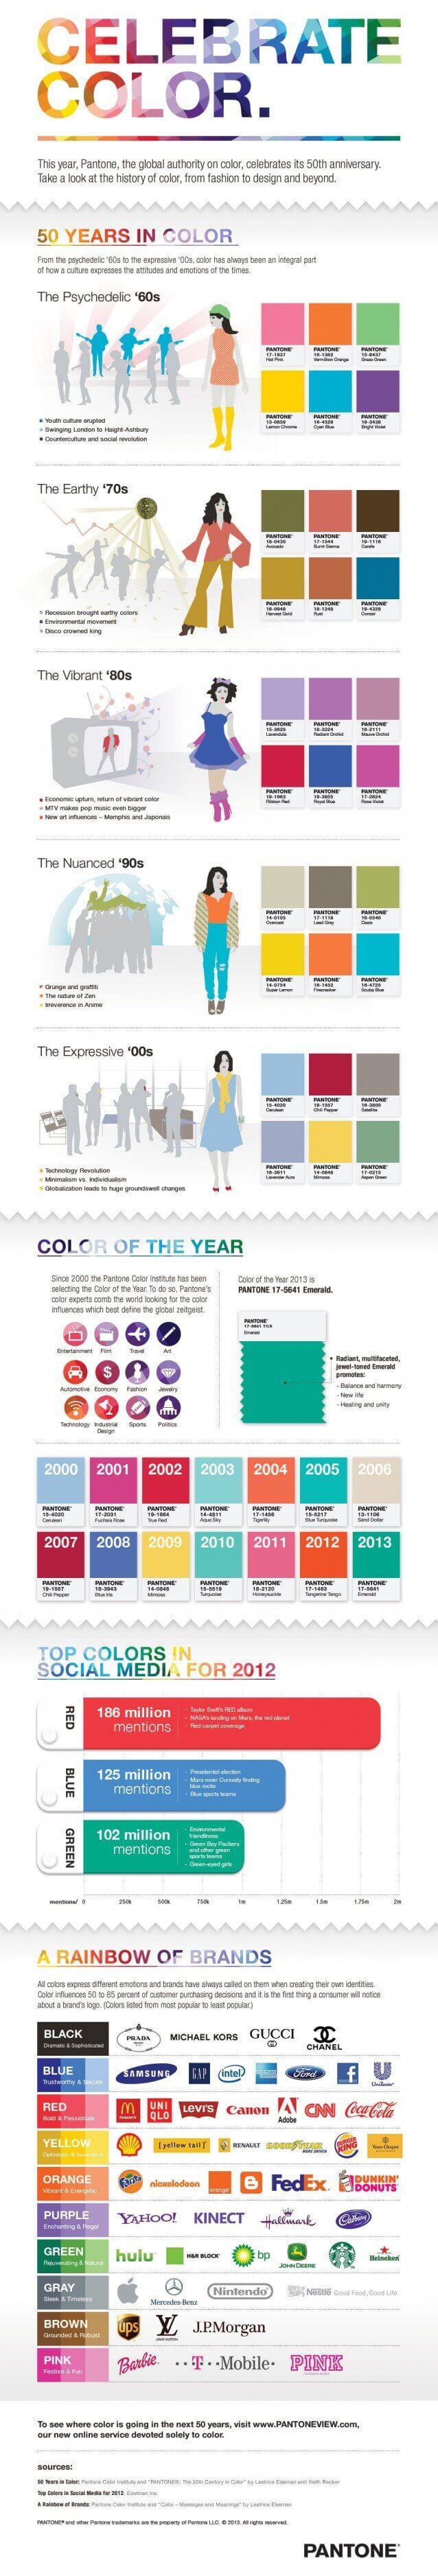 50 anos de Pantone e as cores que representam as décadas